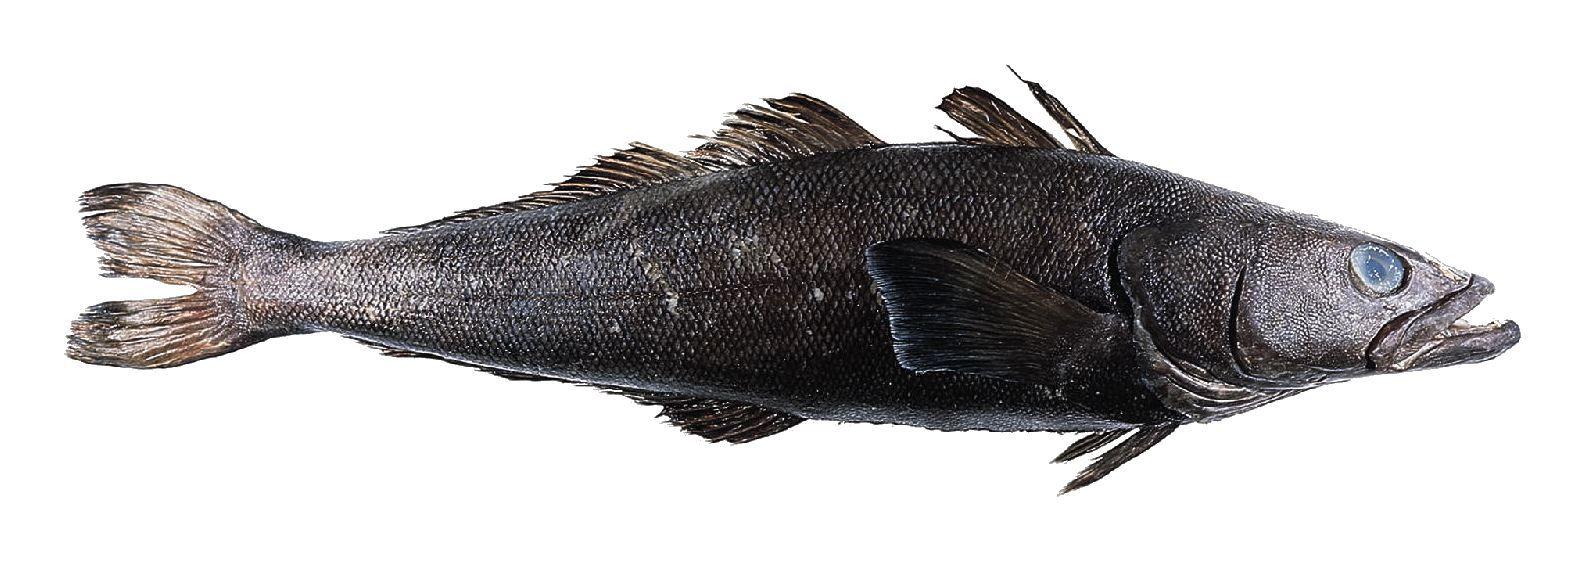 Image of Chilean Sea Bass